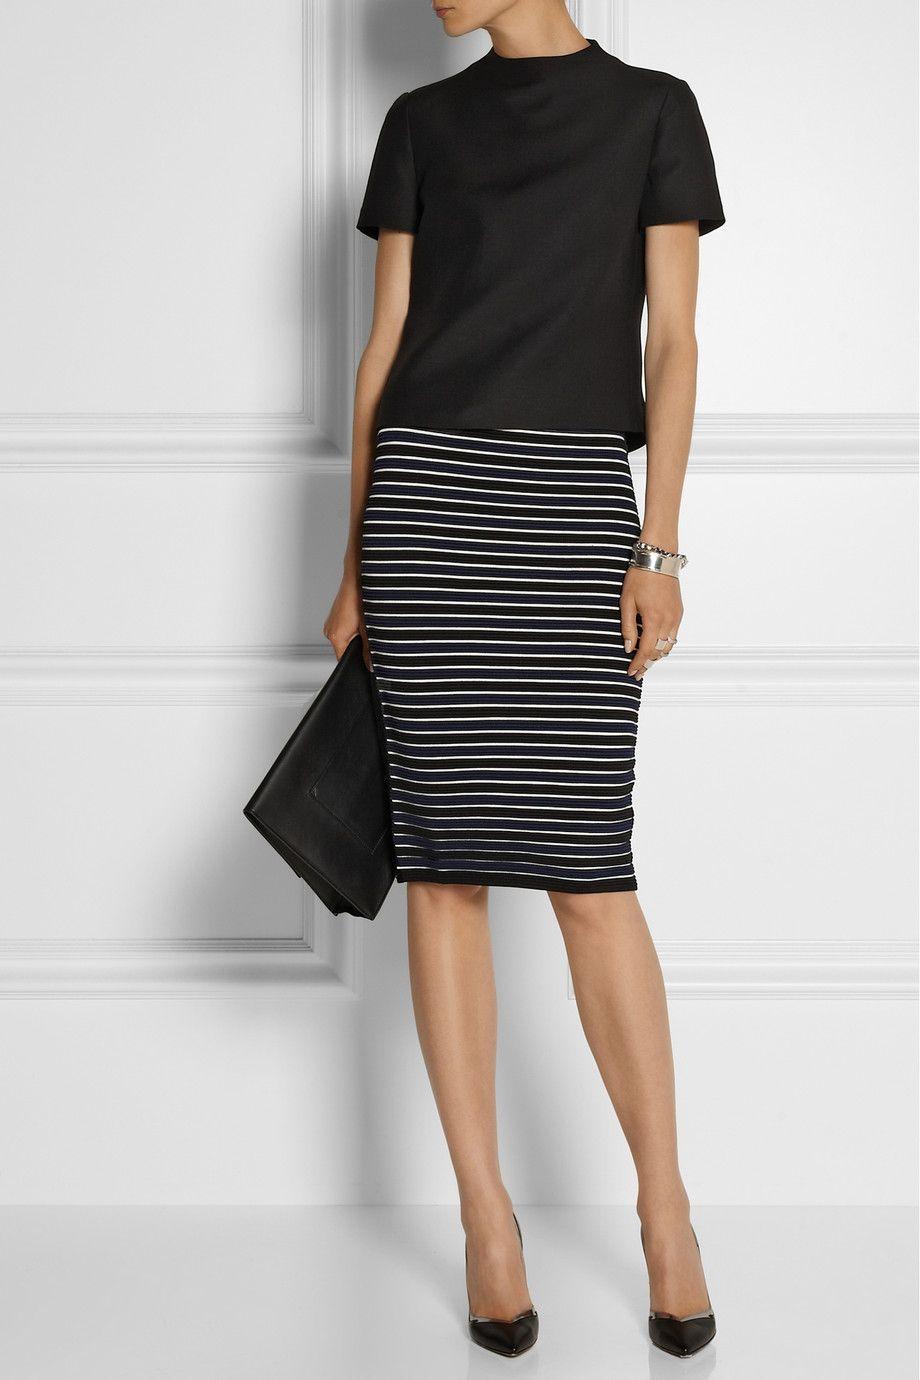 Jonathan Simkhai | Ribbed-knit pencil skirt | NET-A-PORTER ...